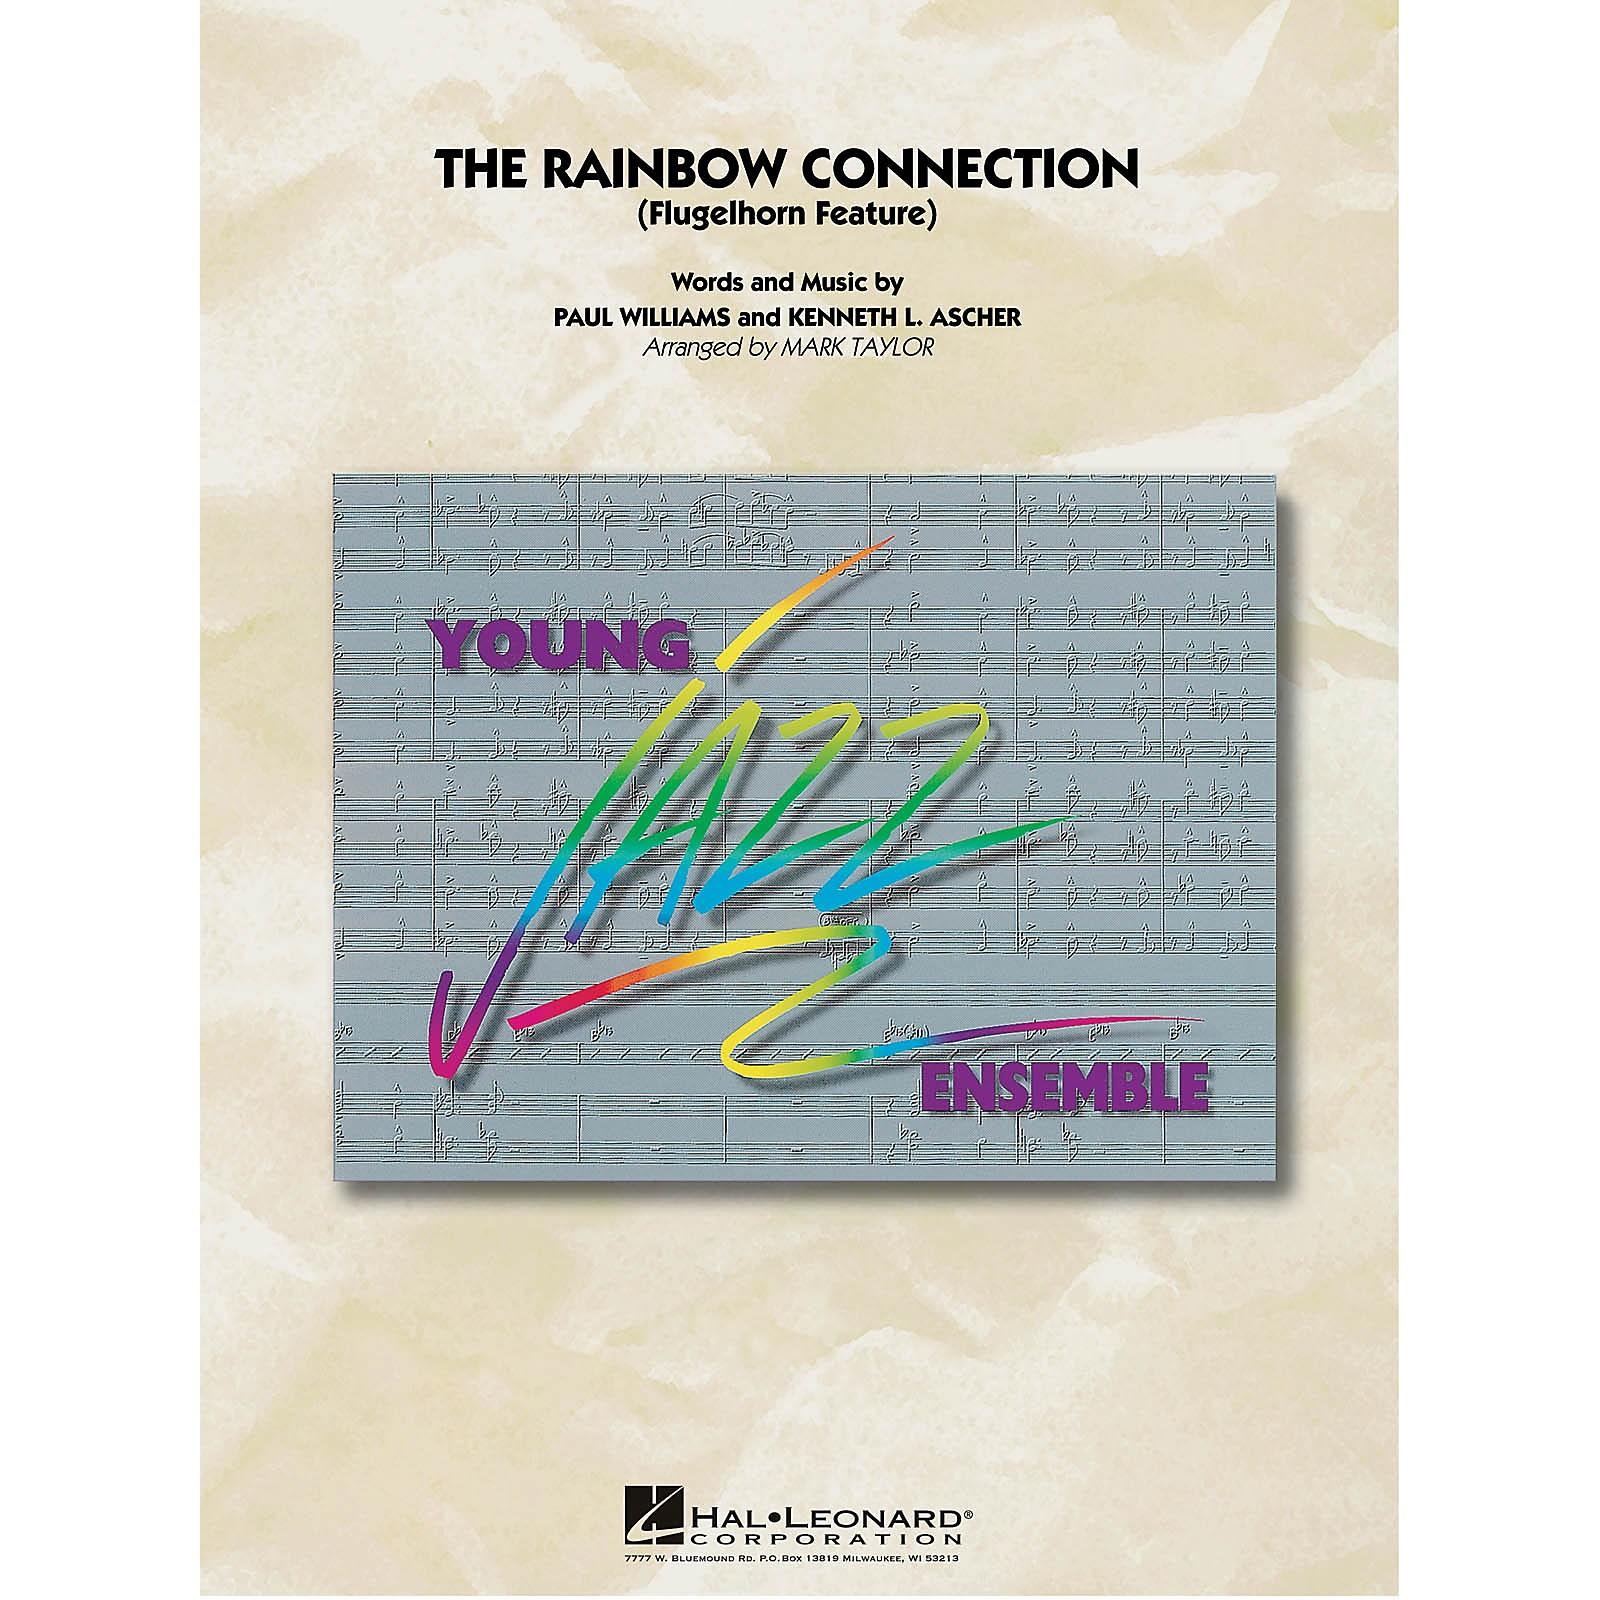 Hal Leonard The Rainbow Connection (Flugelhorn Solo with Jazz Ensemble) Jazz Band Level 3 Arranged by Mark Taylor